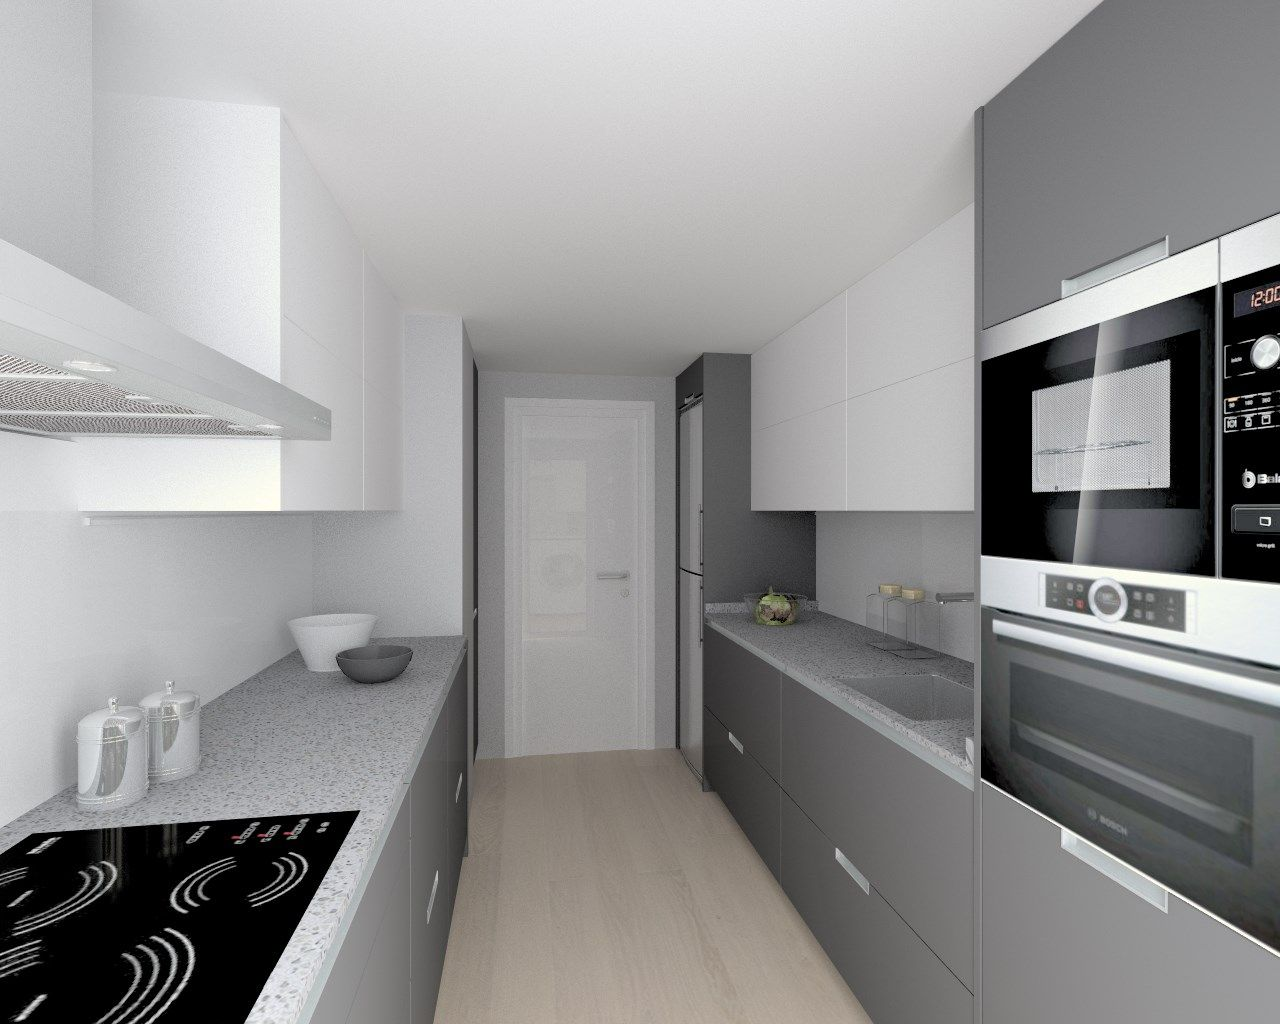 Cocina santos modelo minos estratificado gris antracita for Cocina de madera antracita